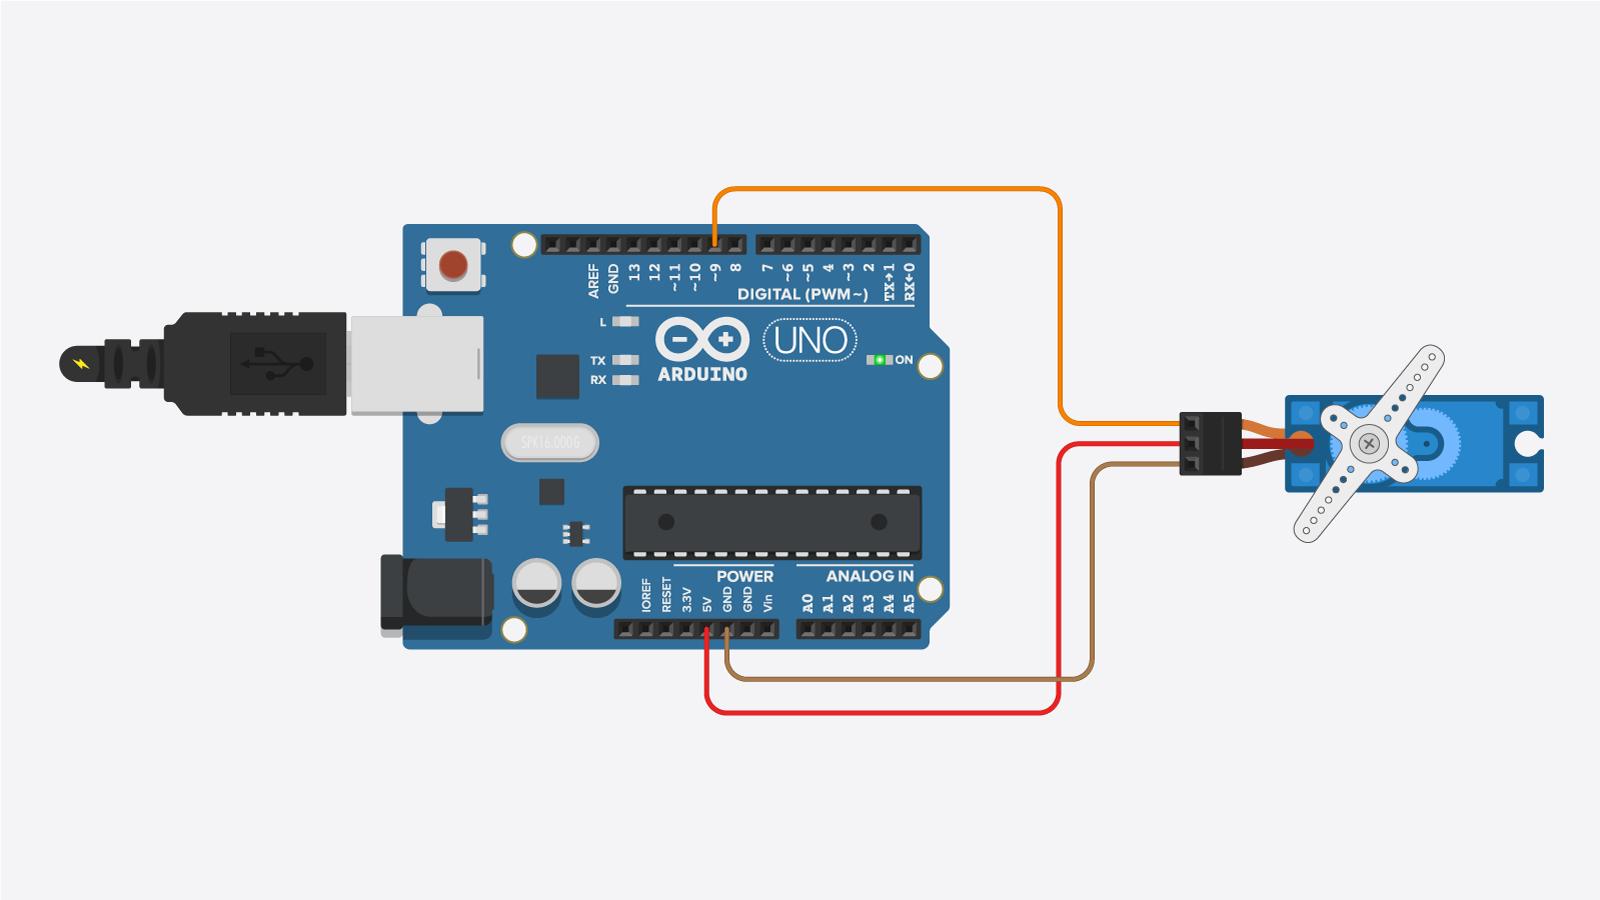 servo-motor-with-arduino-uno-wiring-diagram-schematic-circuit-tutorial-featured-image